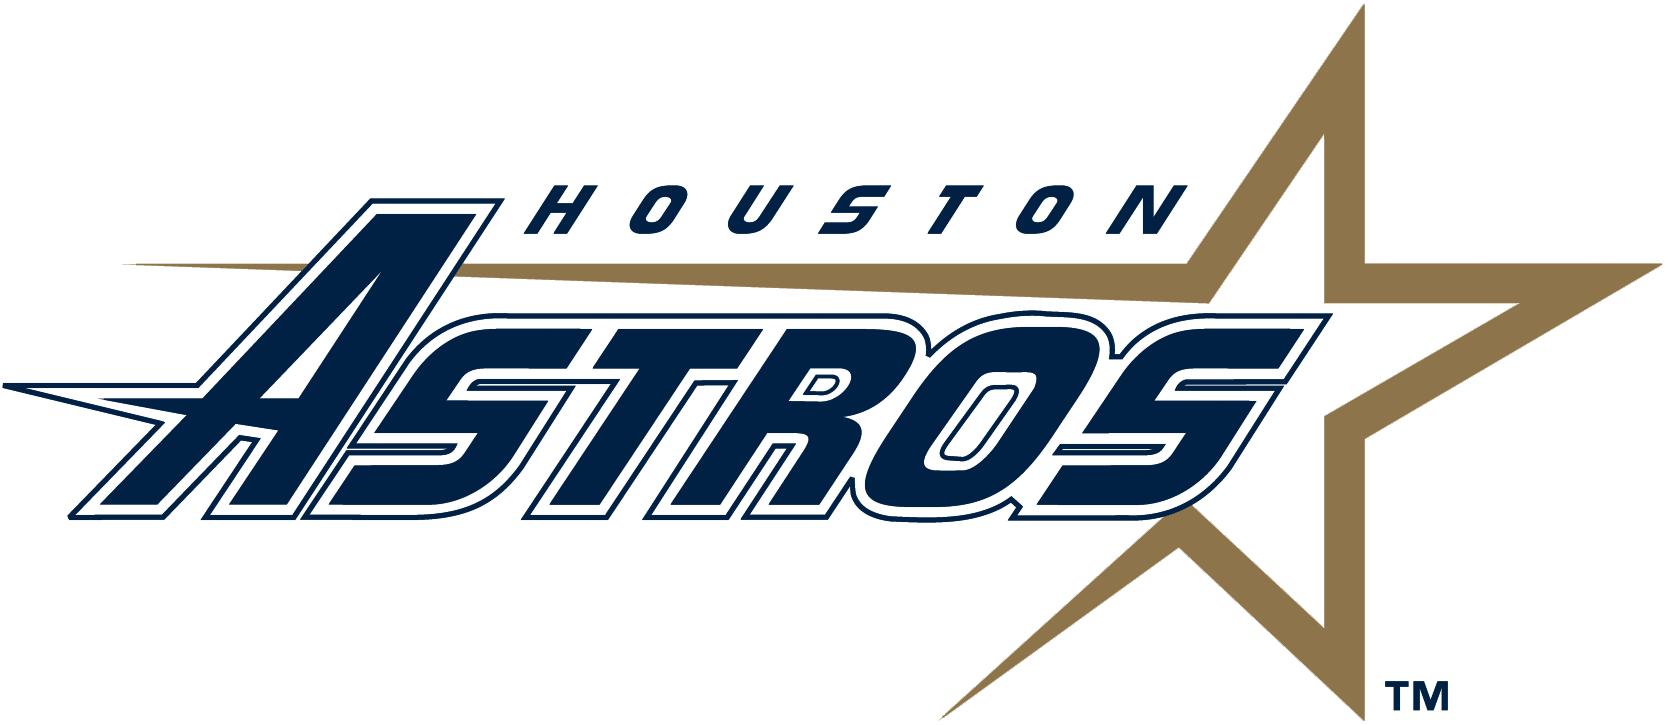 Houston Astros Logo Primary Logo (1995-1999) - Shooting gold star with Houston Astros script SportsLogos.Net